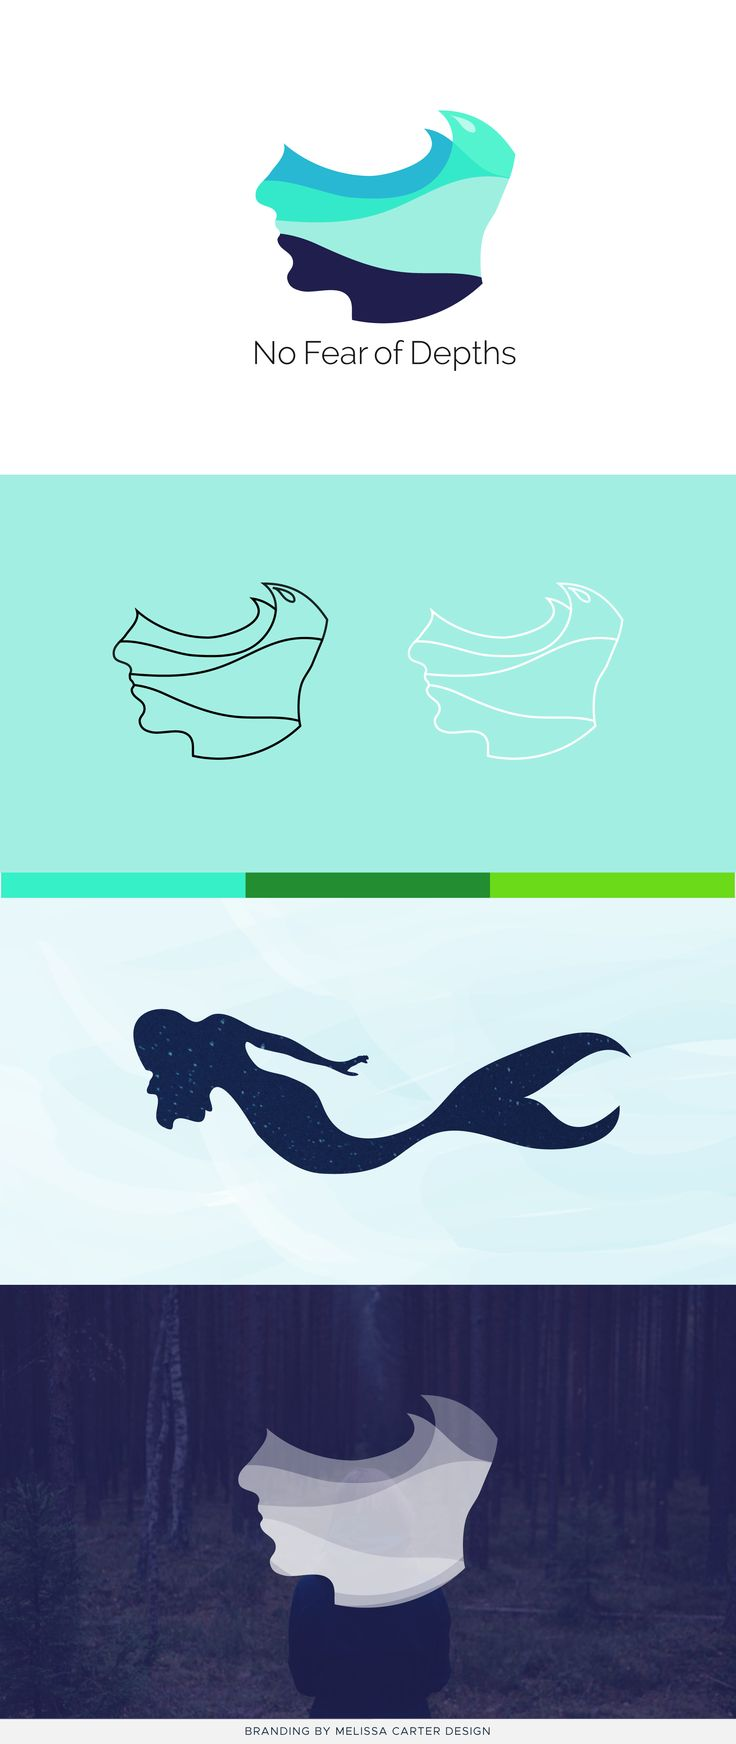 Branding project by Melissa Carter Design.